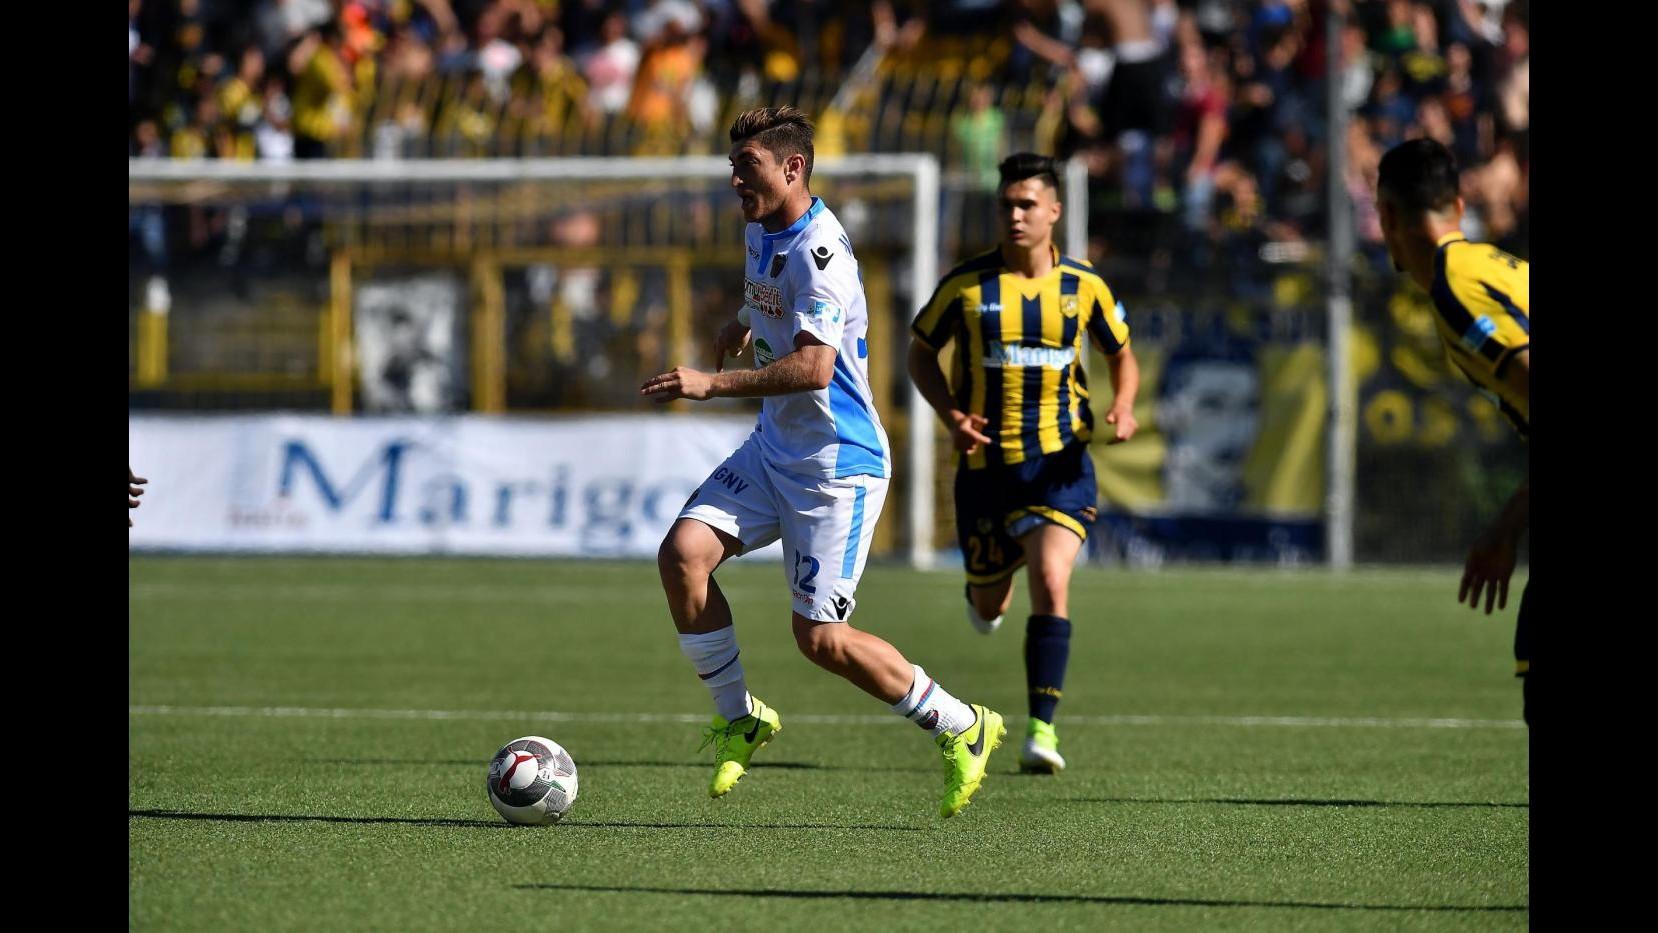 FOTO Lega Pro Playoff, Juve Stabia-Catania 0-0